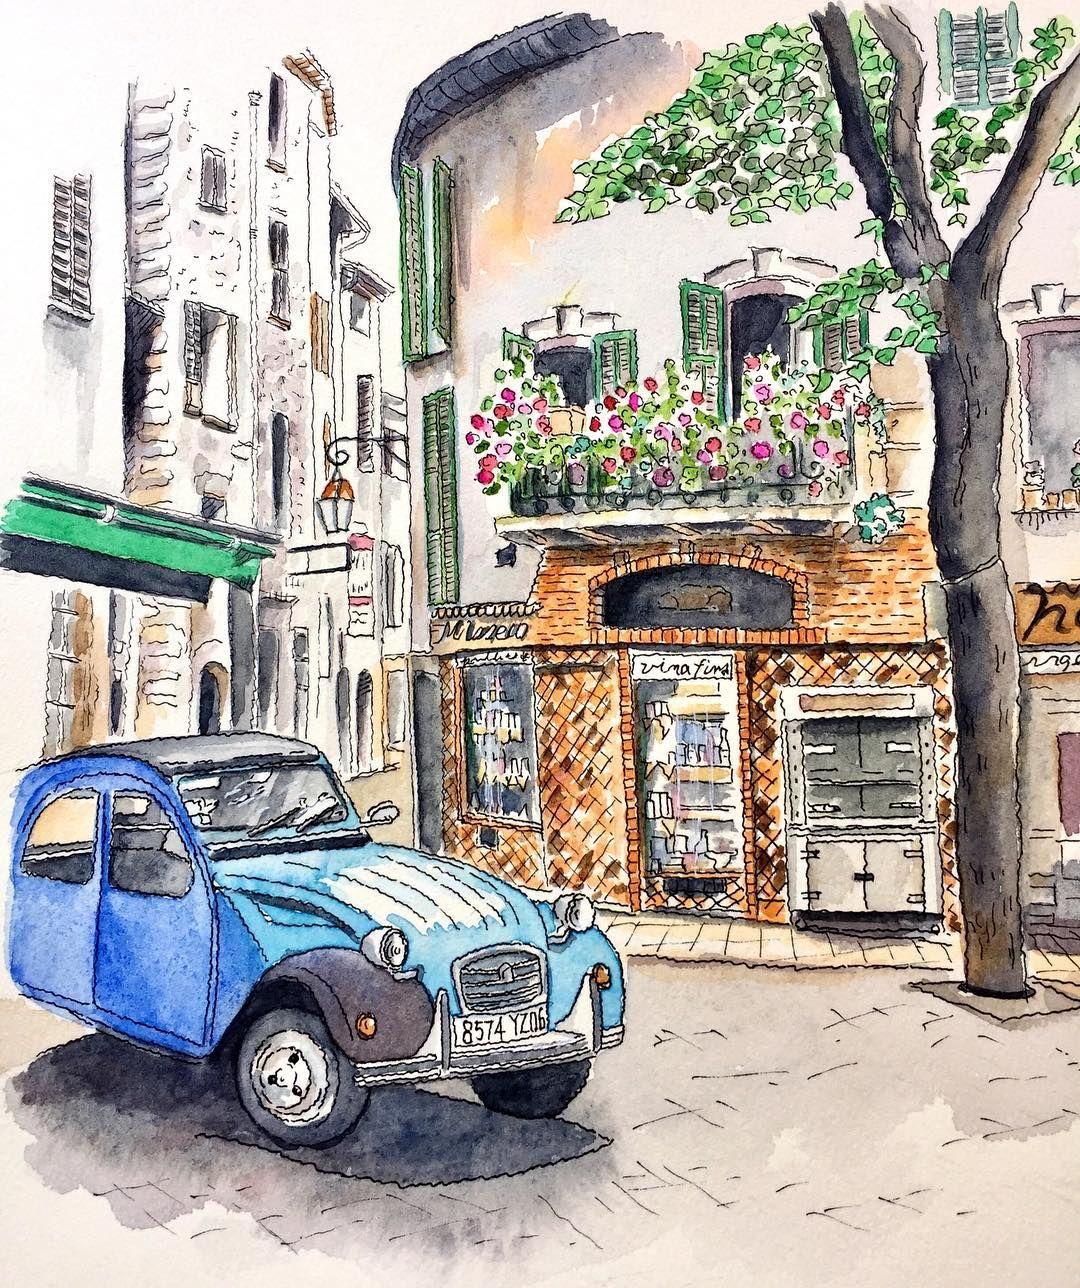 "74 Beğenme, 3 Yorum - Instagram'da いくよ (@ima_iku): ""フランスヴァンス コートダジュールの村のひとつ。 オシャレな車が素敵❗️ #フランス #ヴァンス #ヨーロッパの風景 #風景画 #スケッチ画 #透明水彩画 #イラスト #france…"""